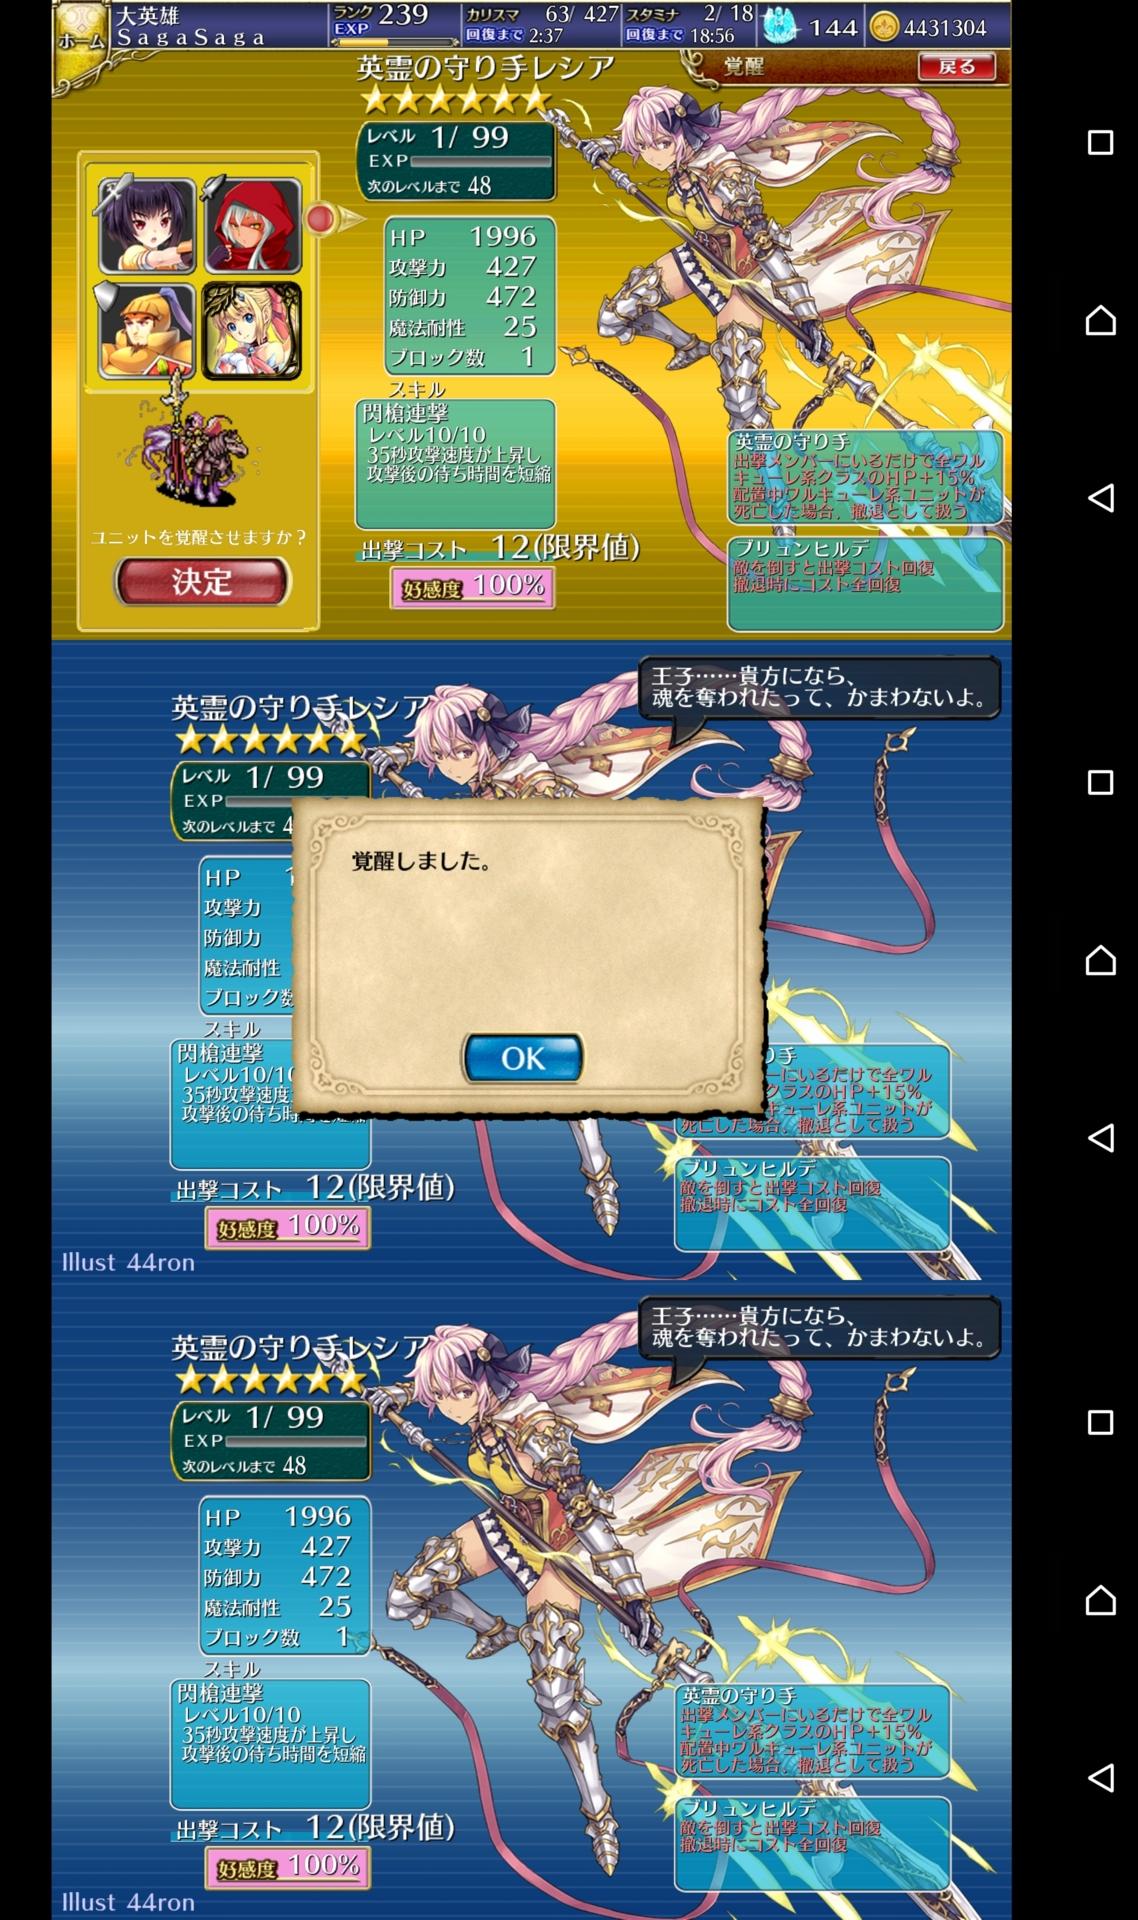 f:id:himajin-mode:20160701144714j:plain